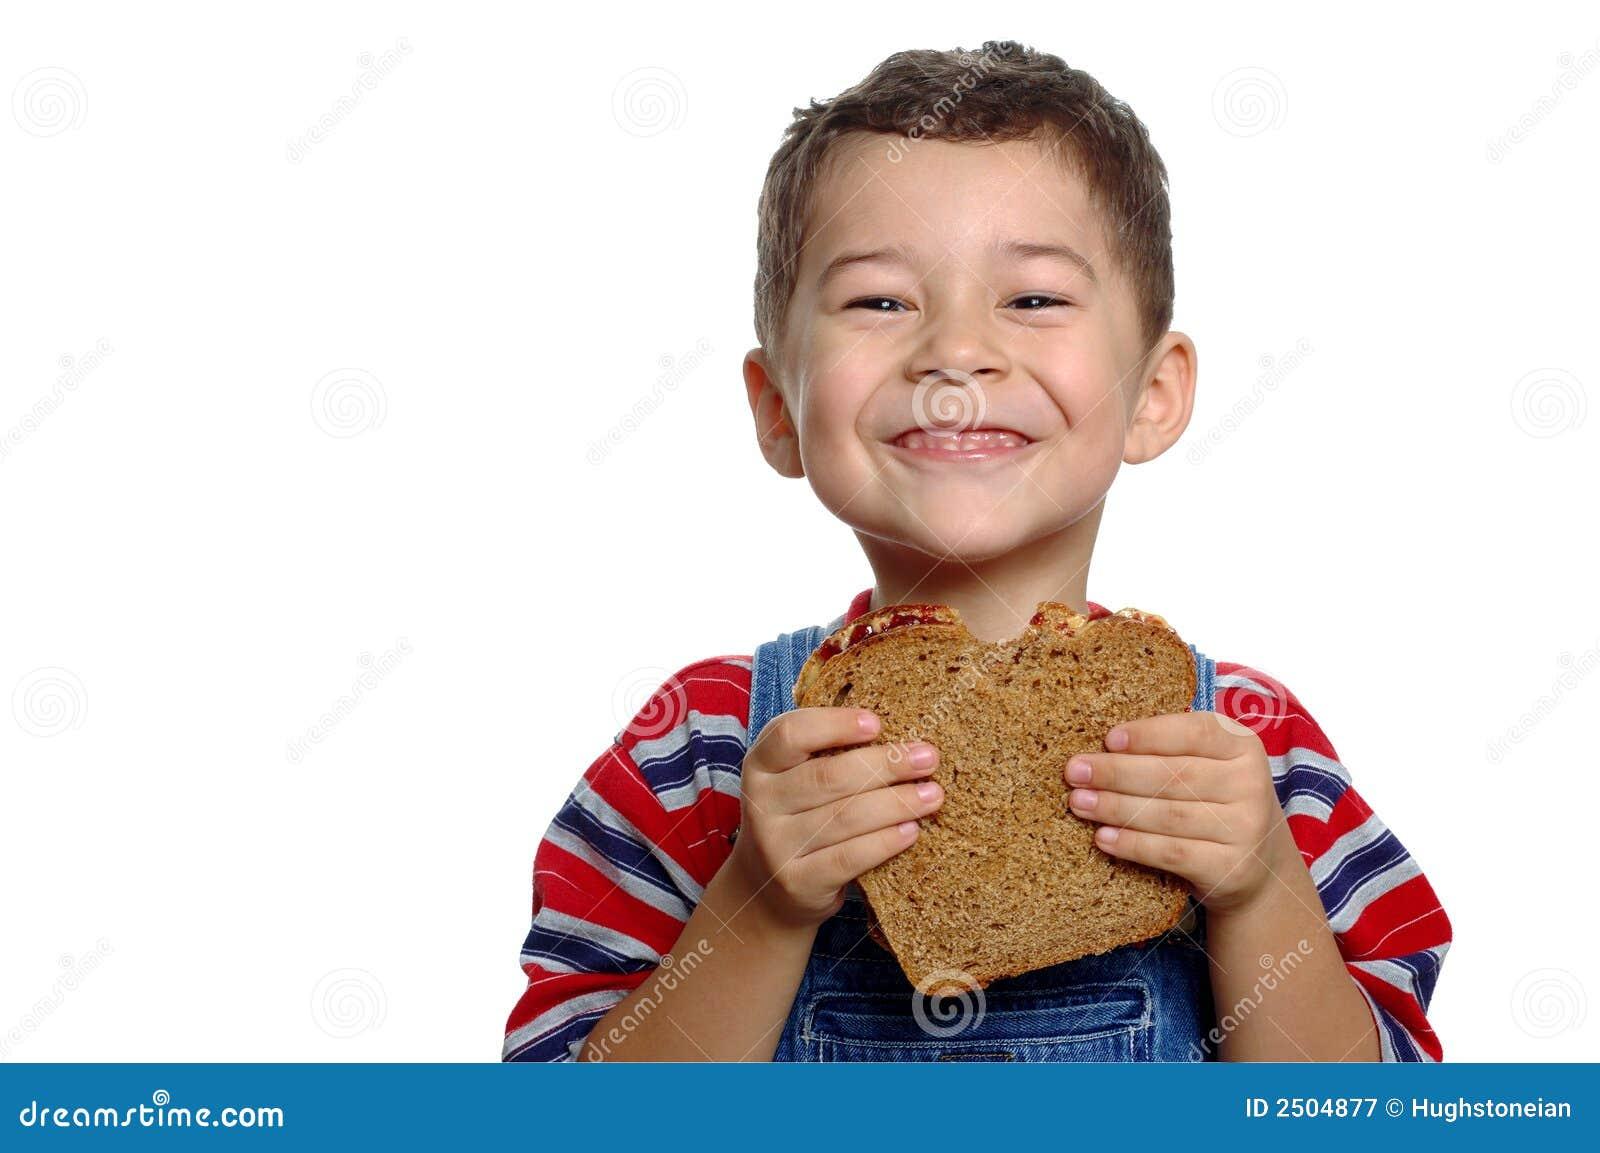 Boy and Peanut Butter Sandwich